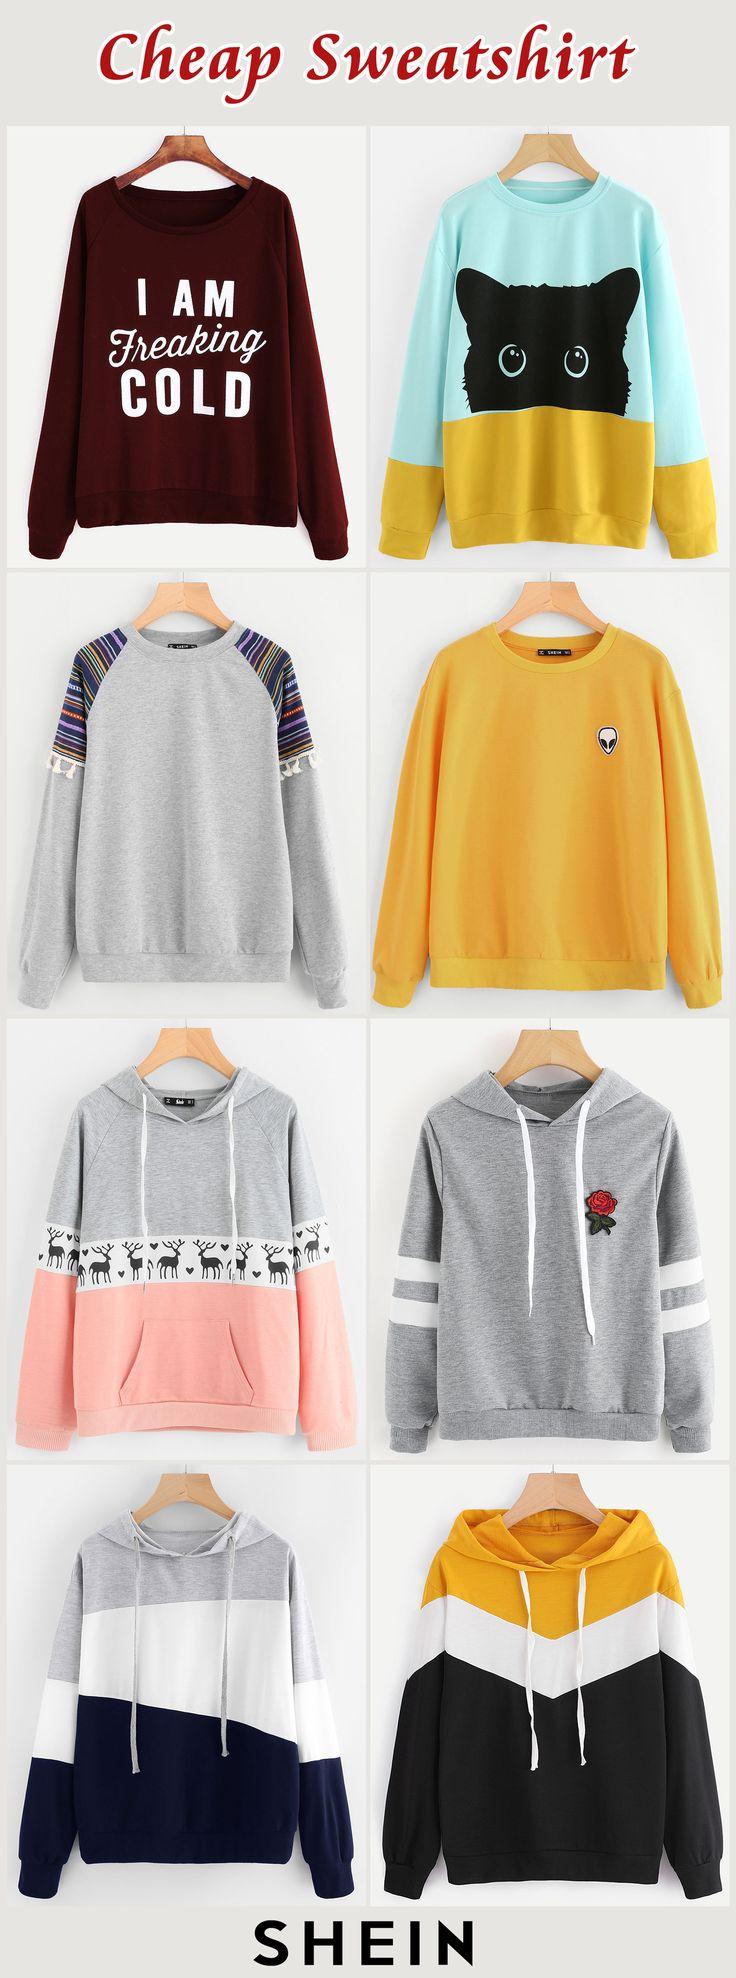 Cheap Sweatshirt